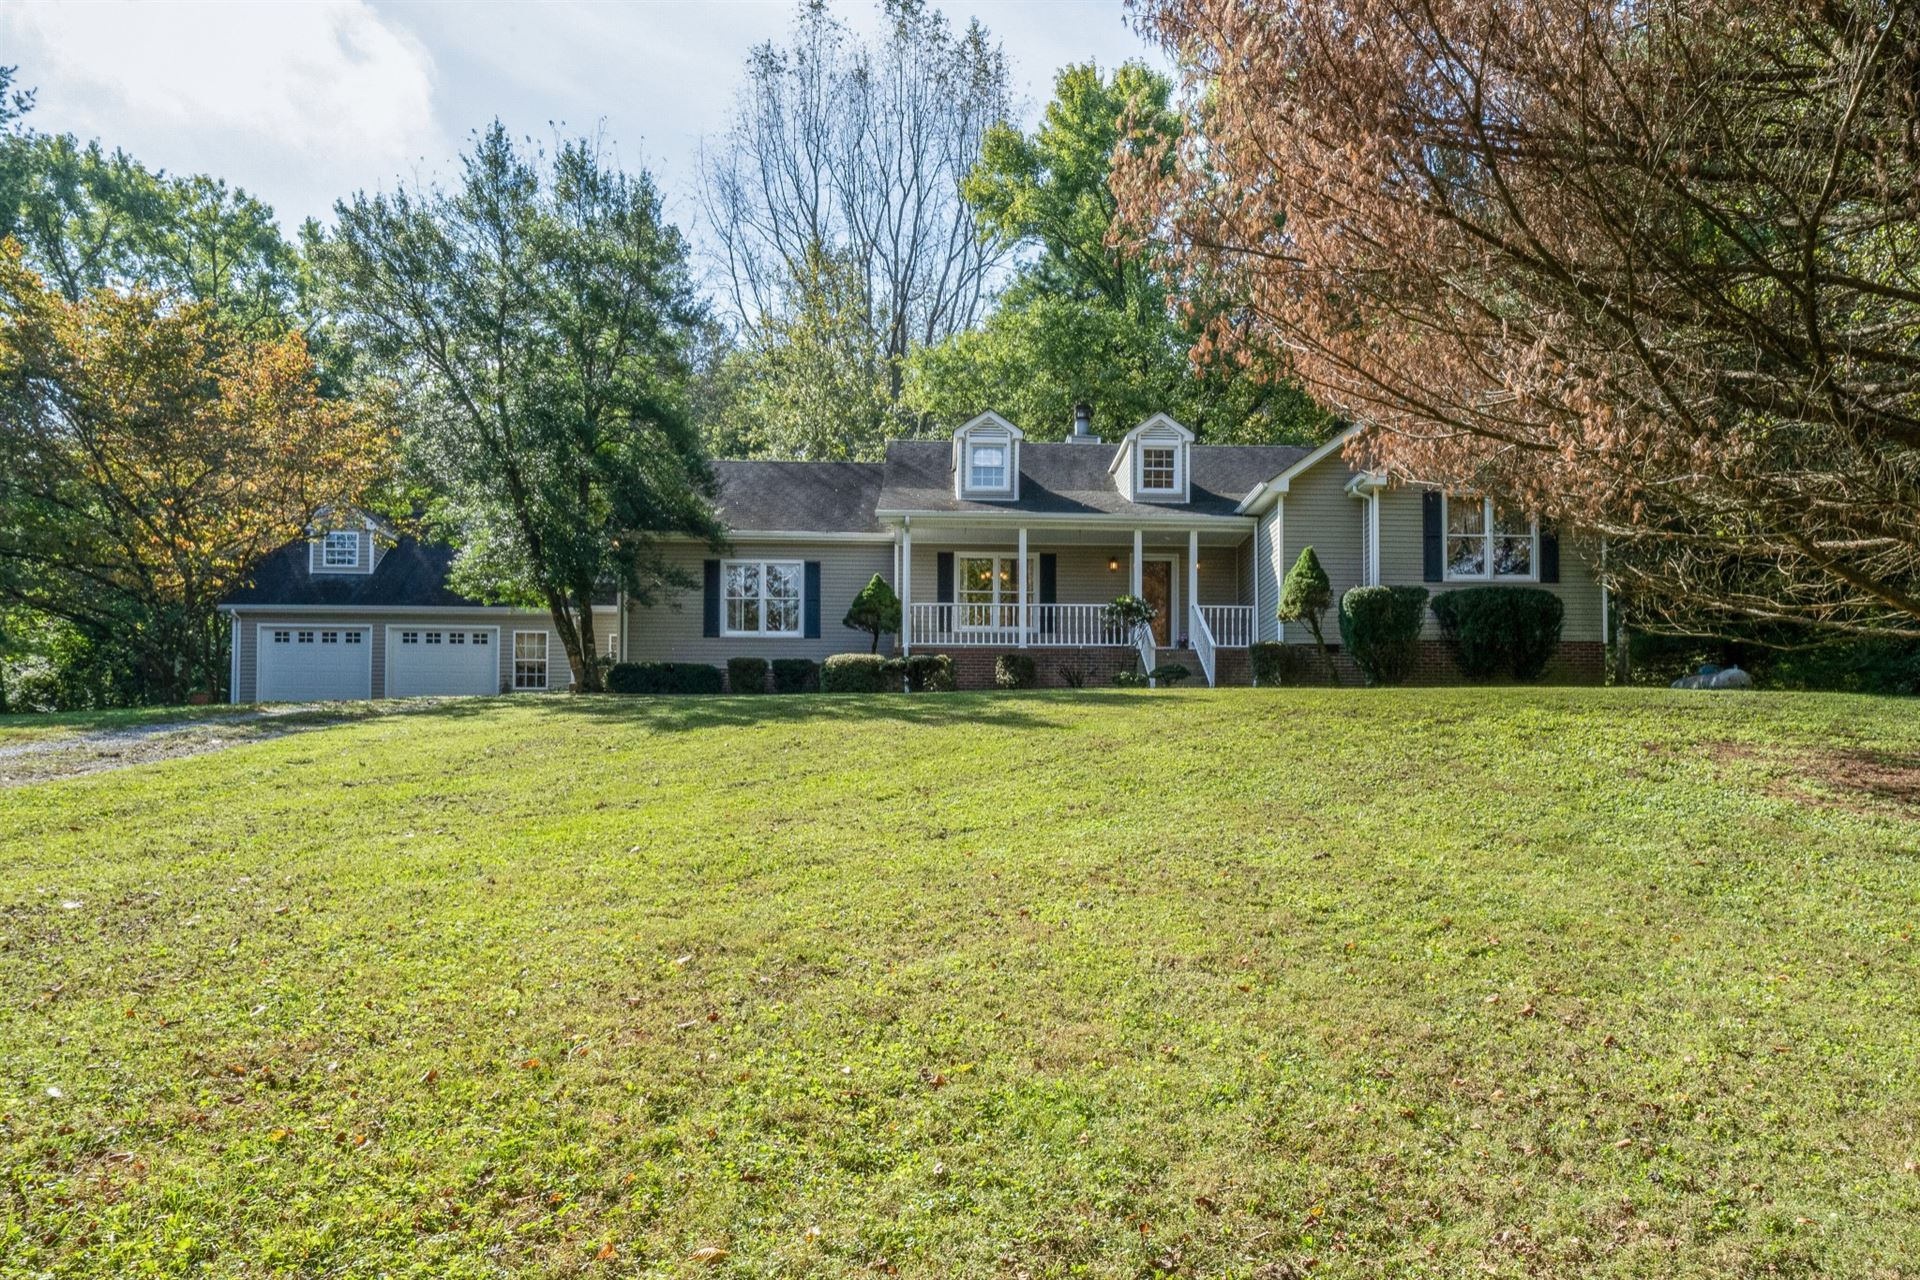 4049 Clovercroft Rd, Franklin, TN 37067 - MLS#: 2299706